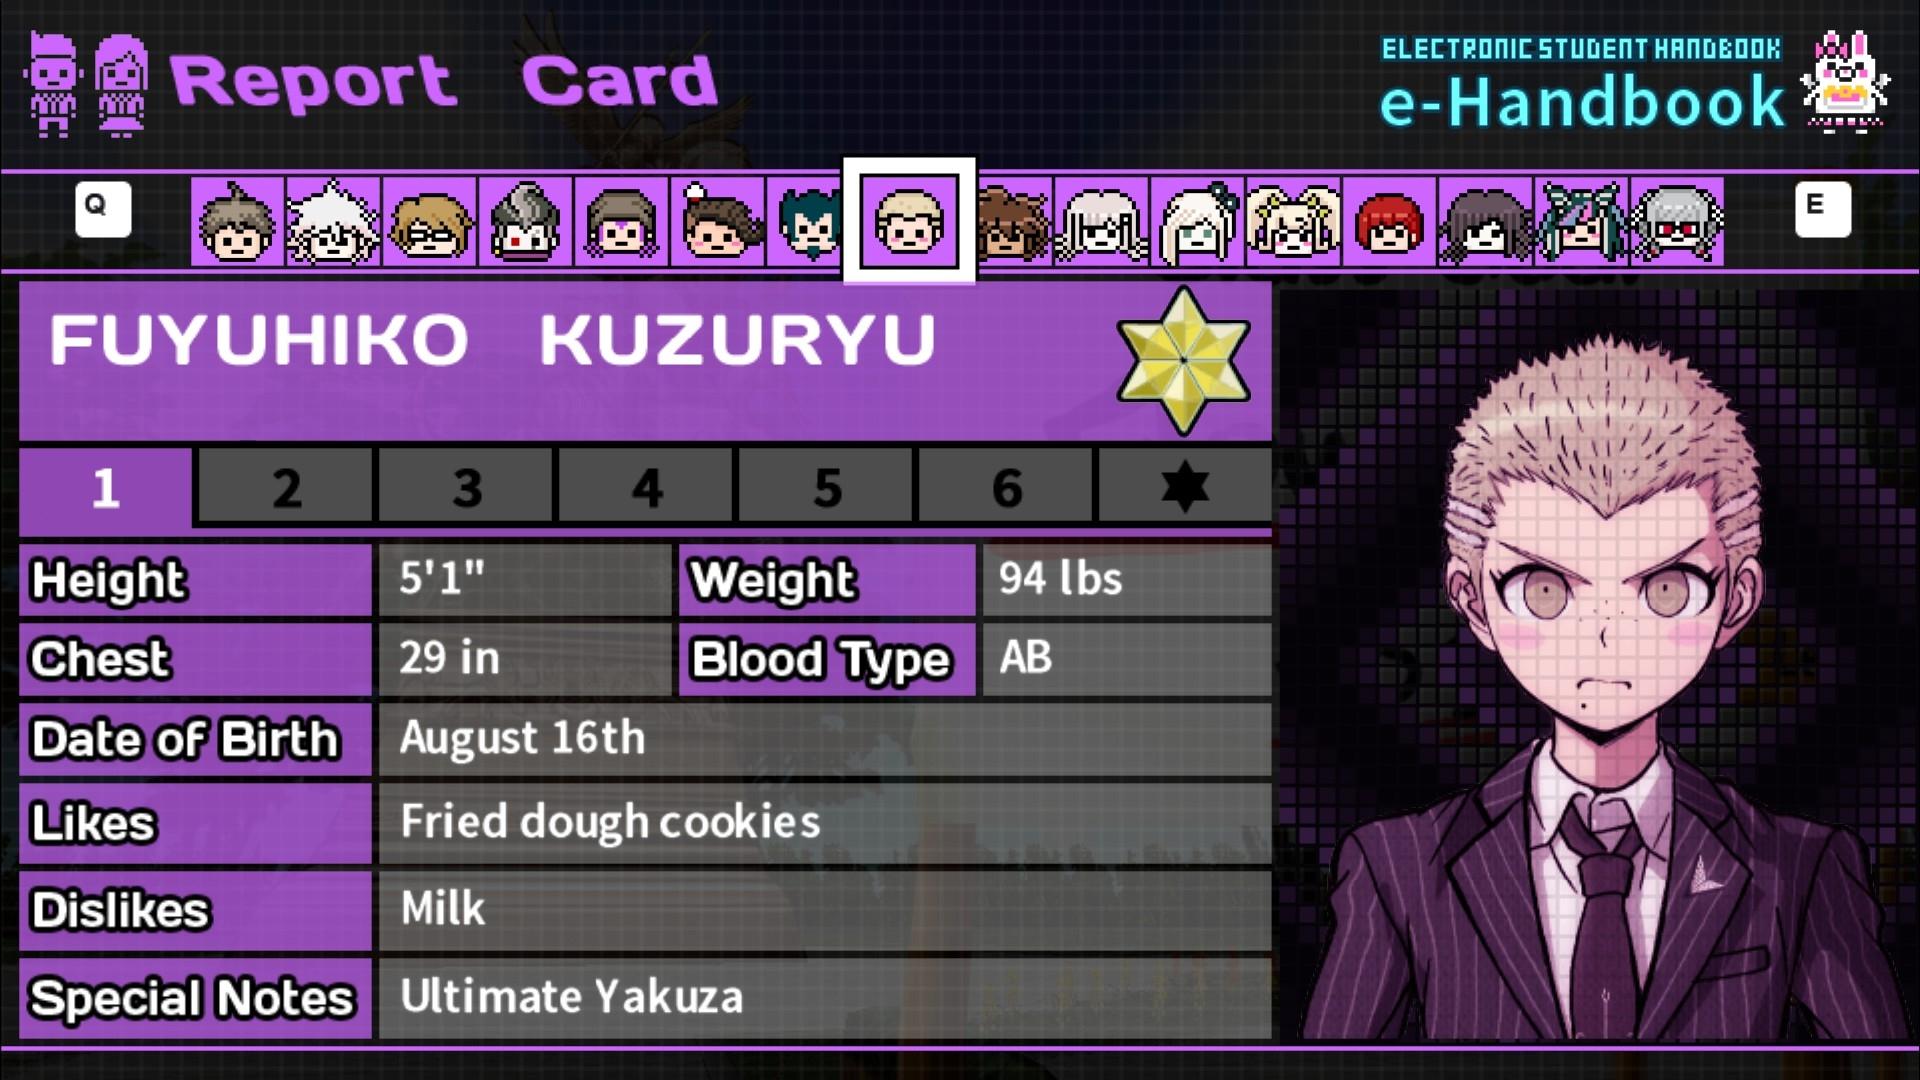 danganronpa 2 report card  Free Time Events/Fuyuhiko Kuzuryu | Danganronpa Wiki | Fandom